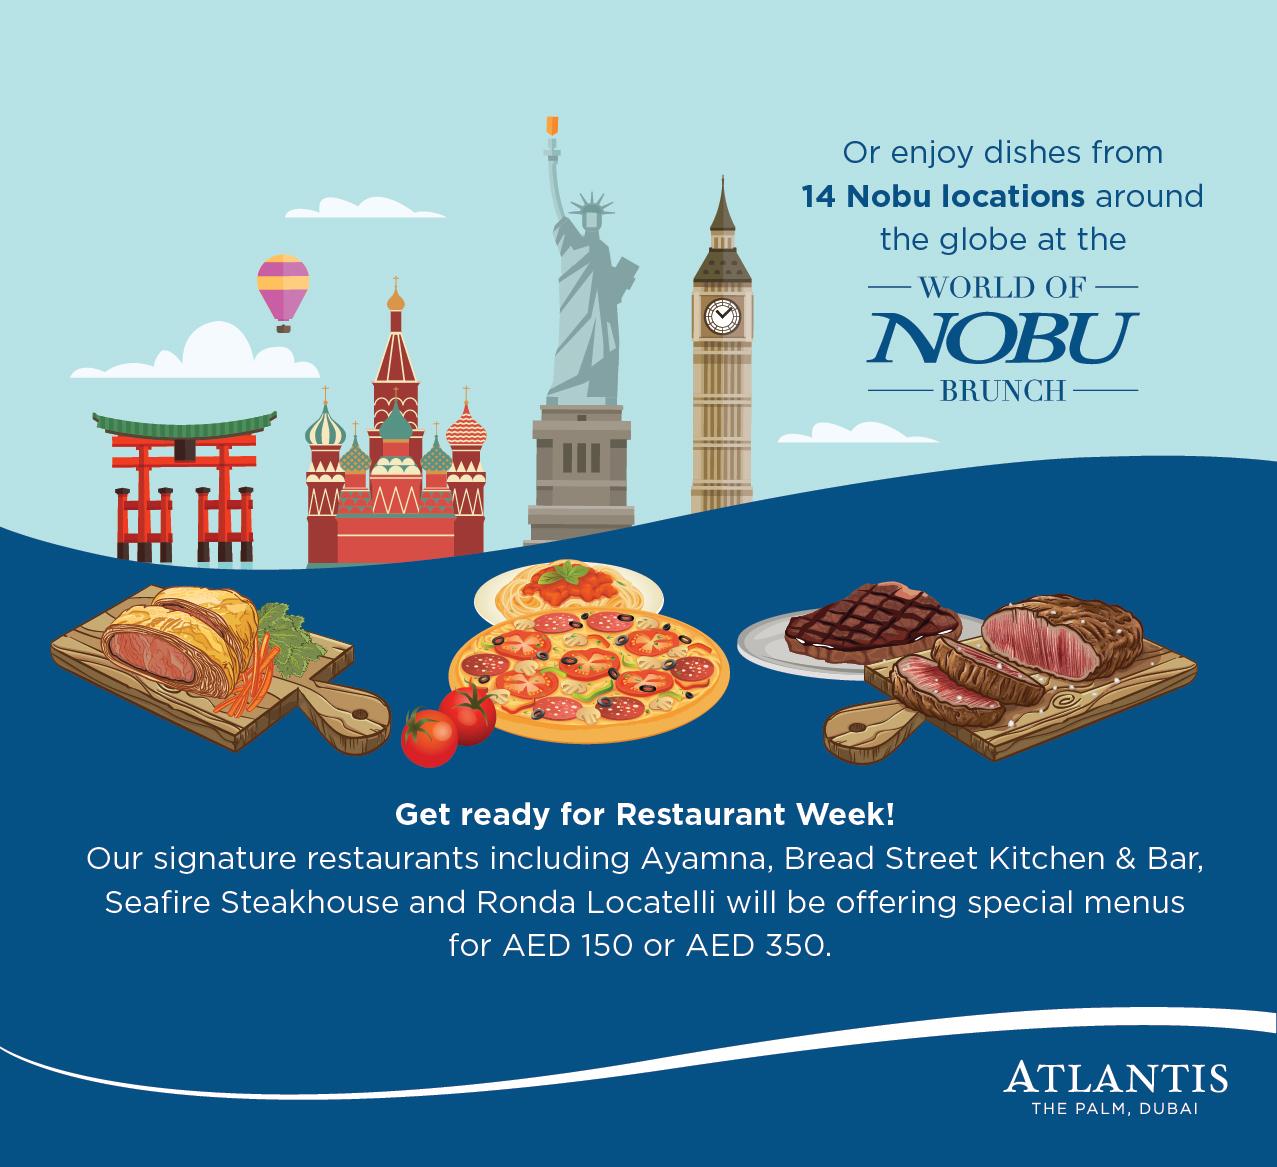 culinary-month-chef-nobu-atlantis-restaurant-week-in-dubai